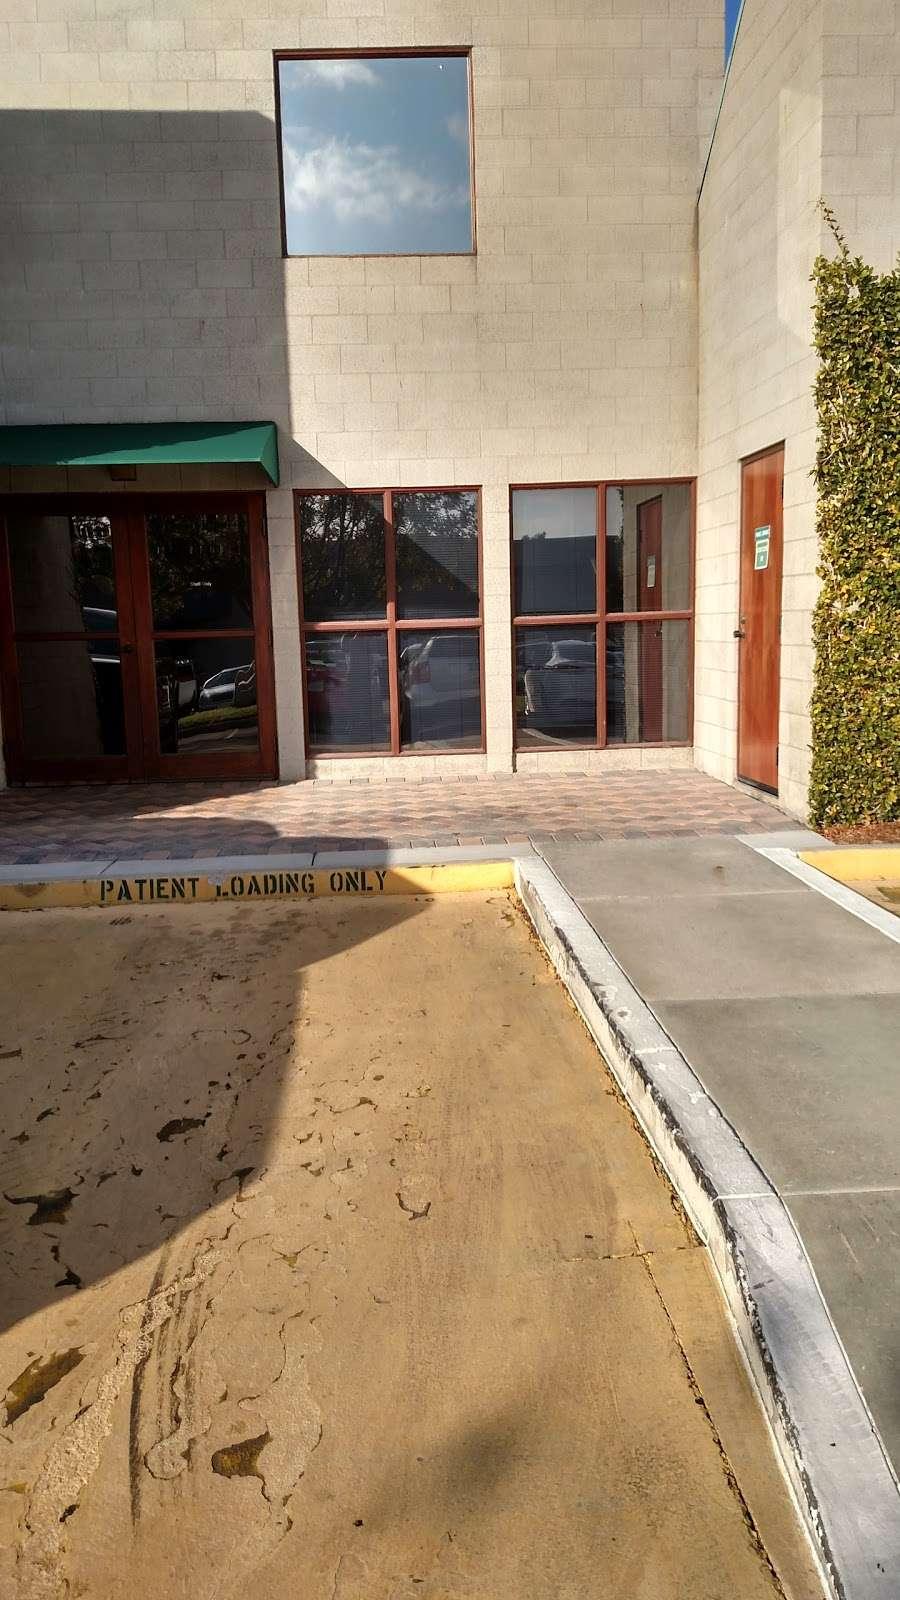 North Coast Surgery Center - health  | Photo 2 of 2 | Address: 3903 Waring Rd, Oceanside, CA 92056, USA | Phone: (760) 940-0997